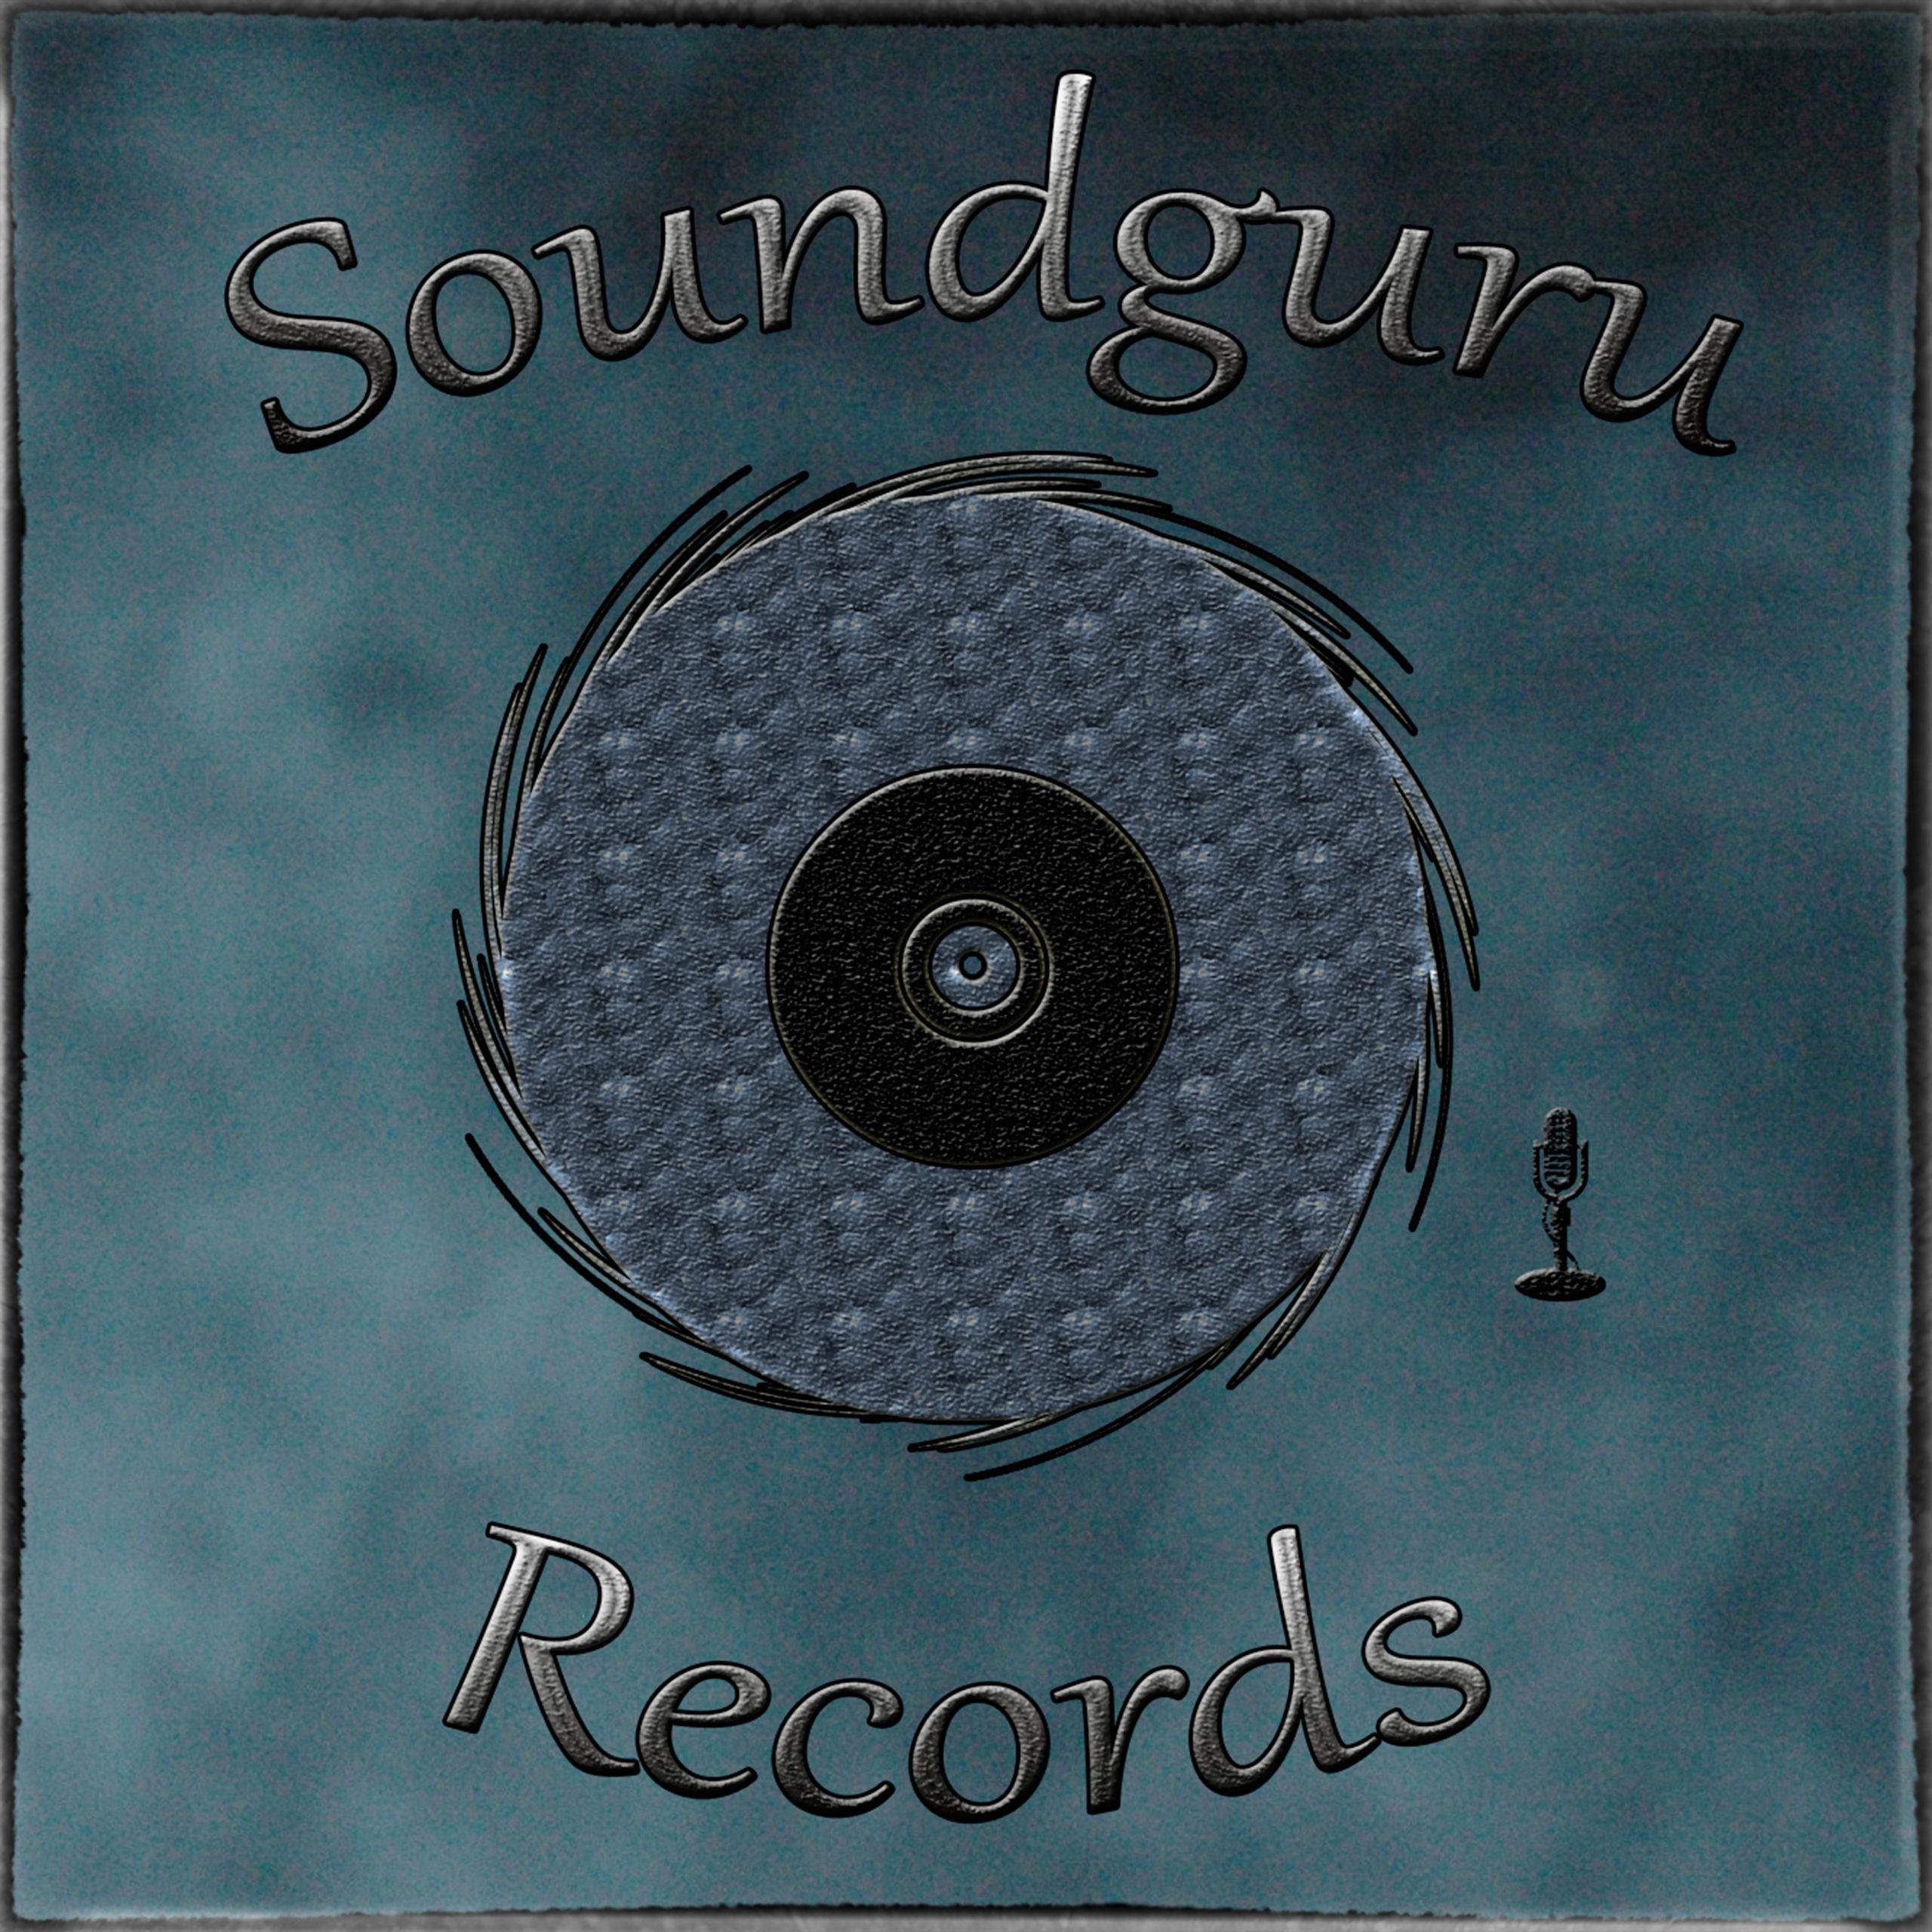 Soundguru Records